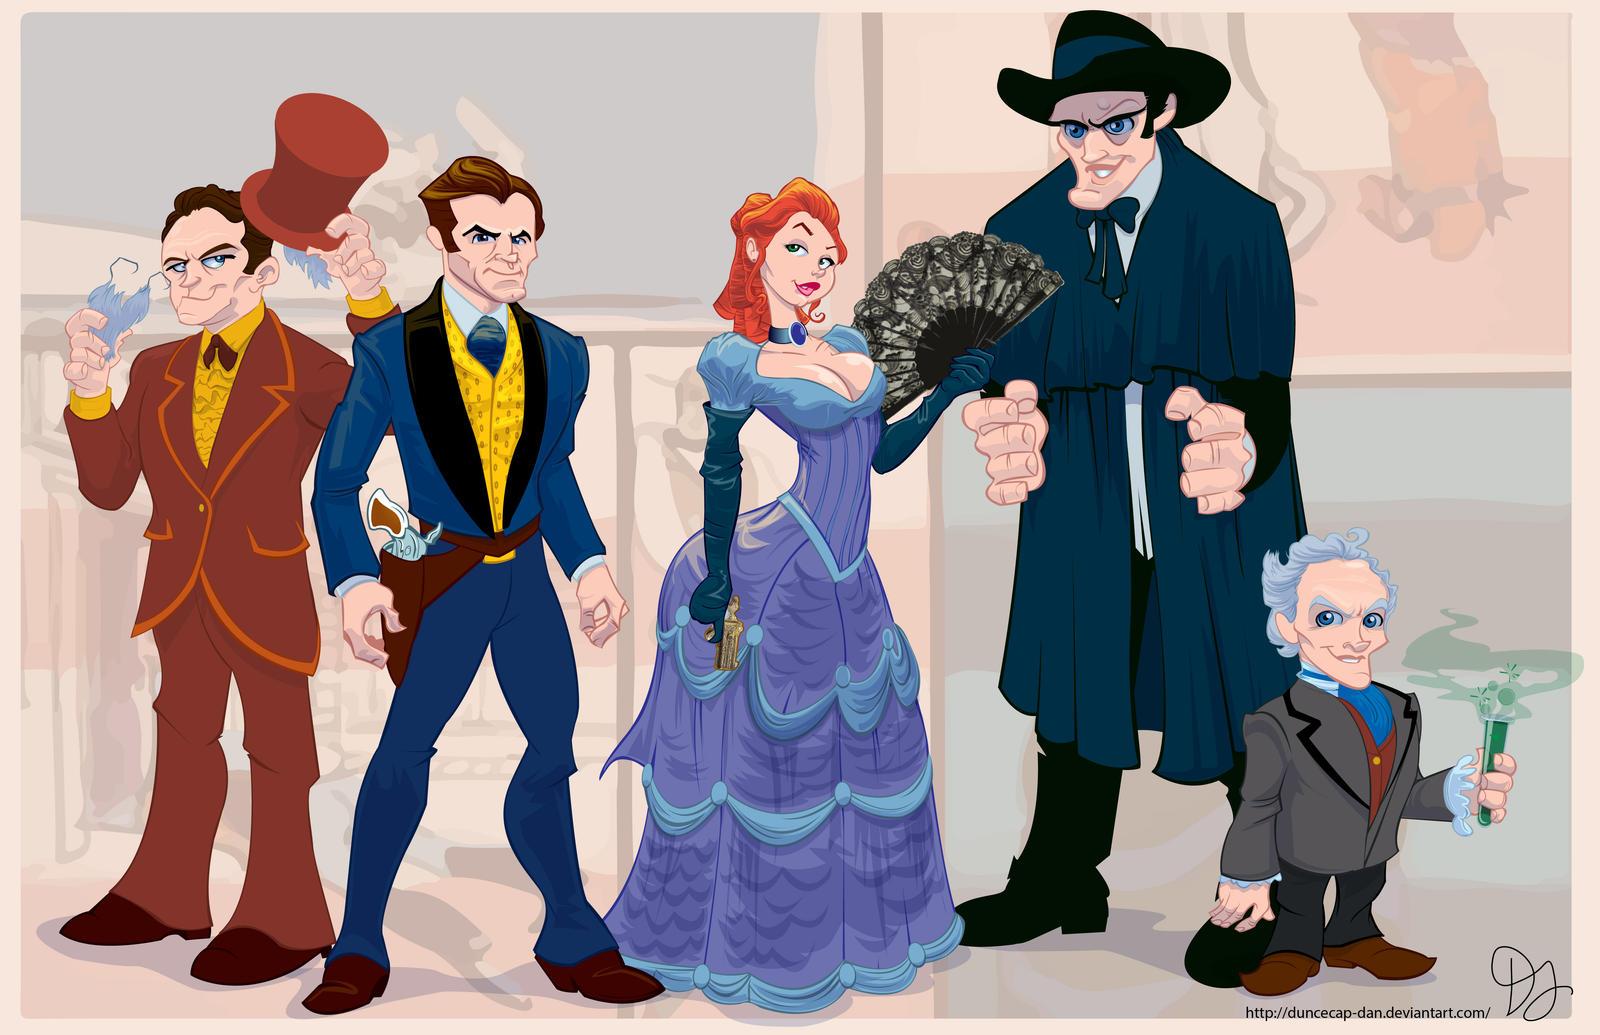 Wild Wild West Animated By Duncecap Dan On Deviantart